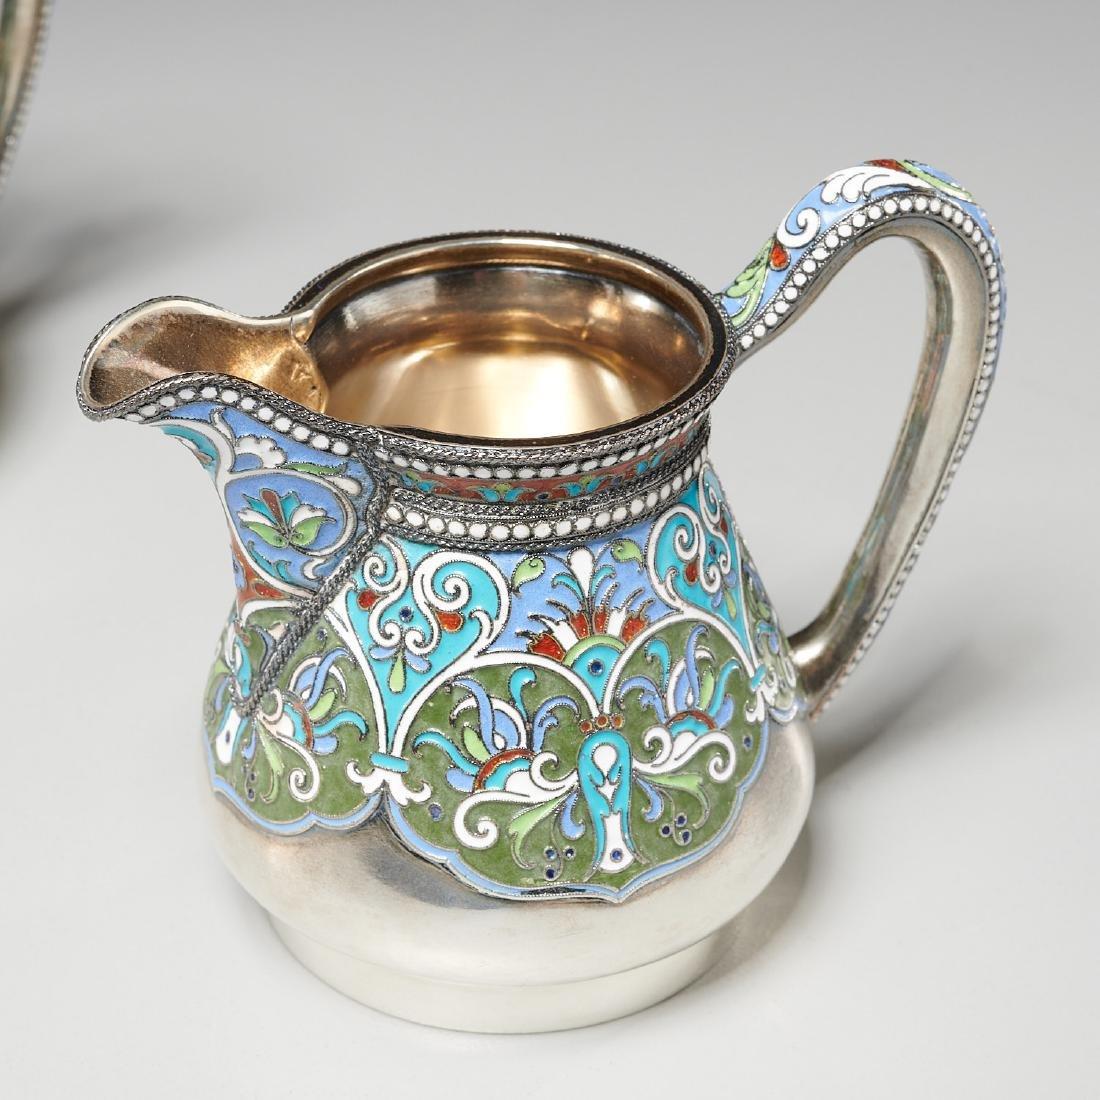 Vasily Agafonov enameled silver coffee service - 5